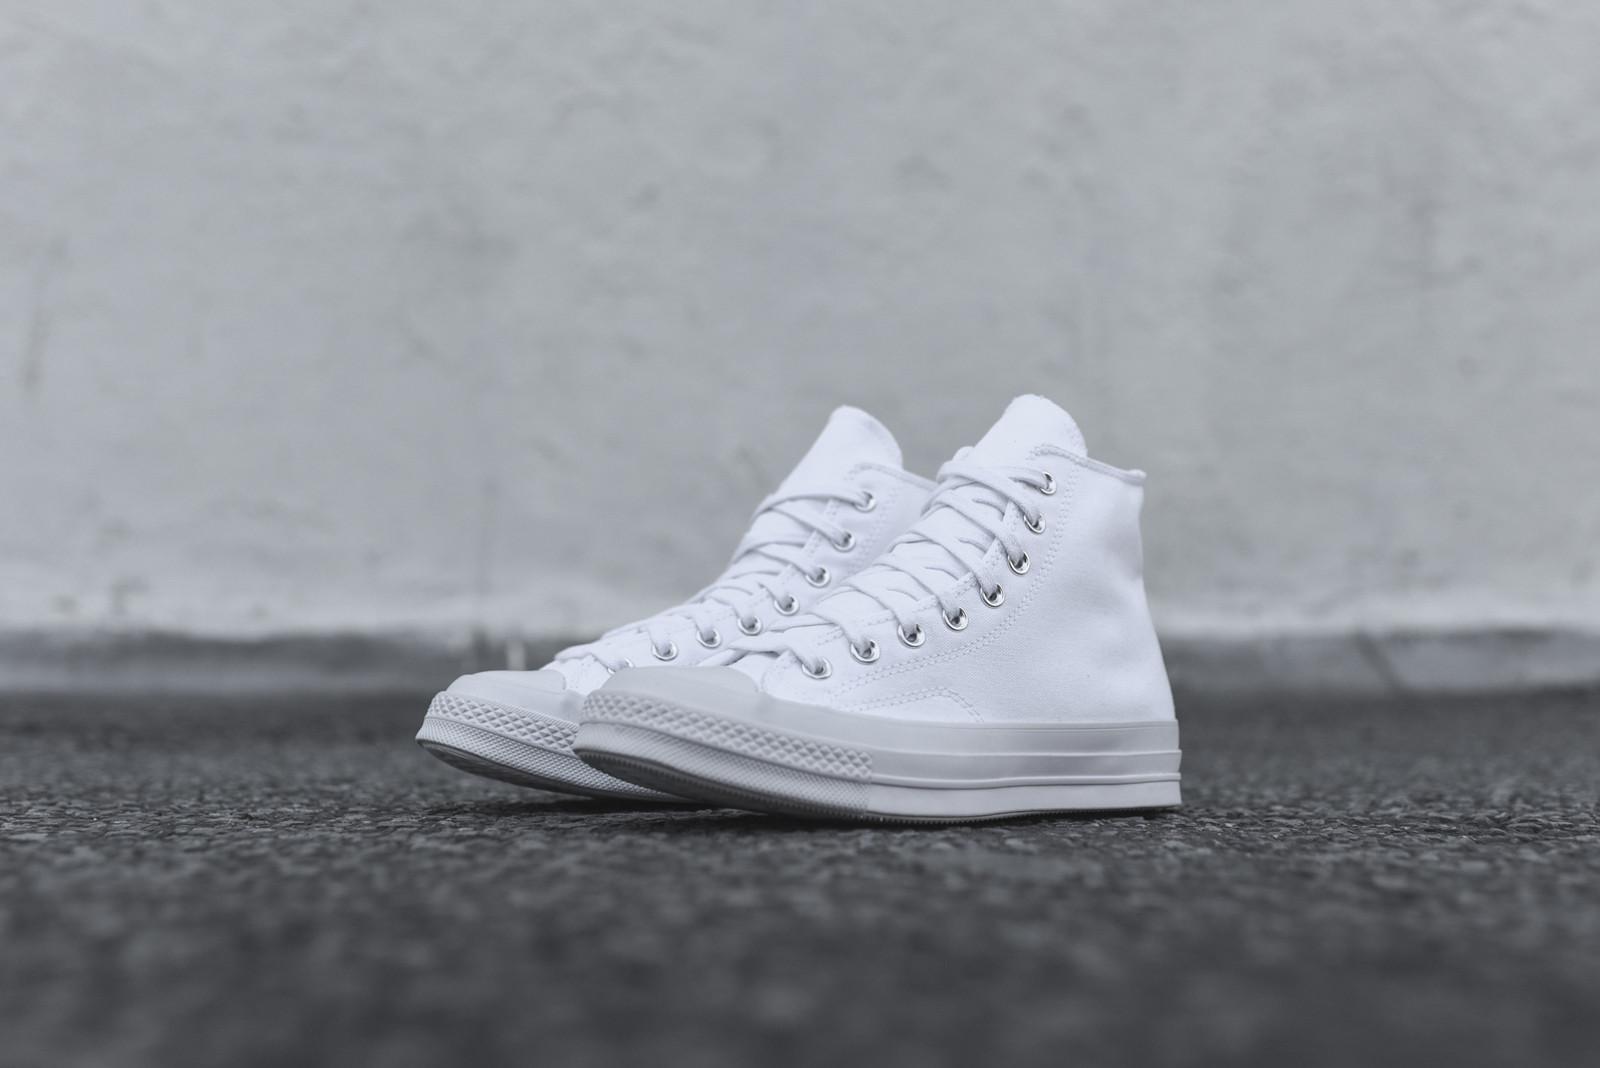 Converse_CTAS_70_Hi_-_White-White_153876C_3